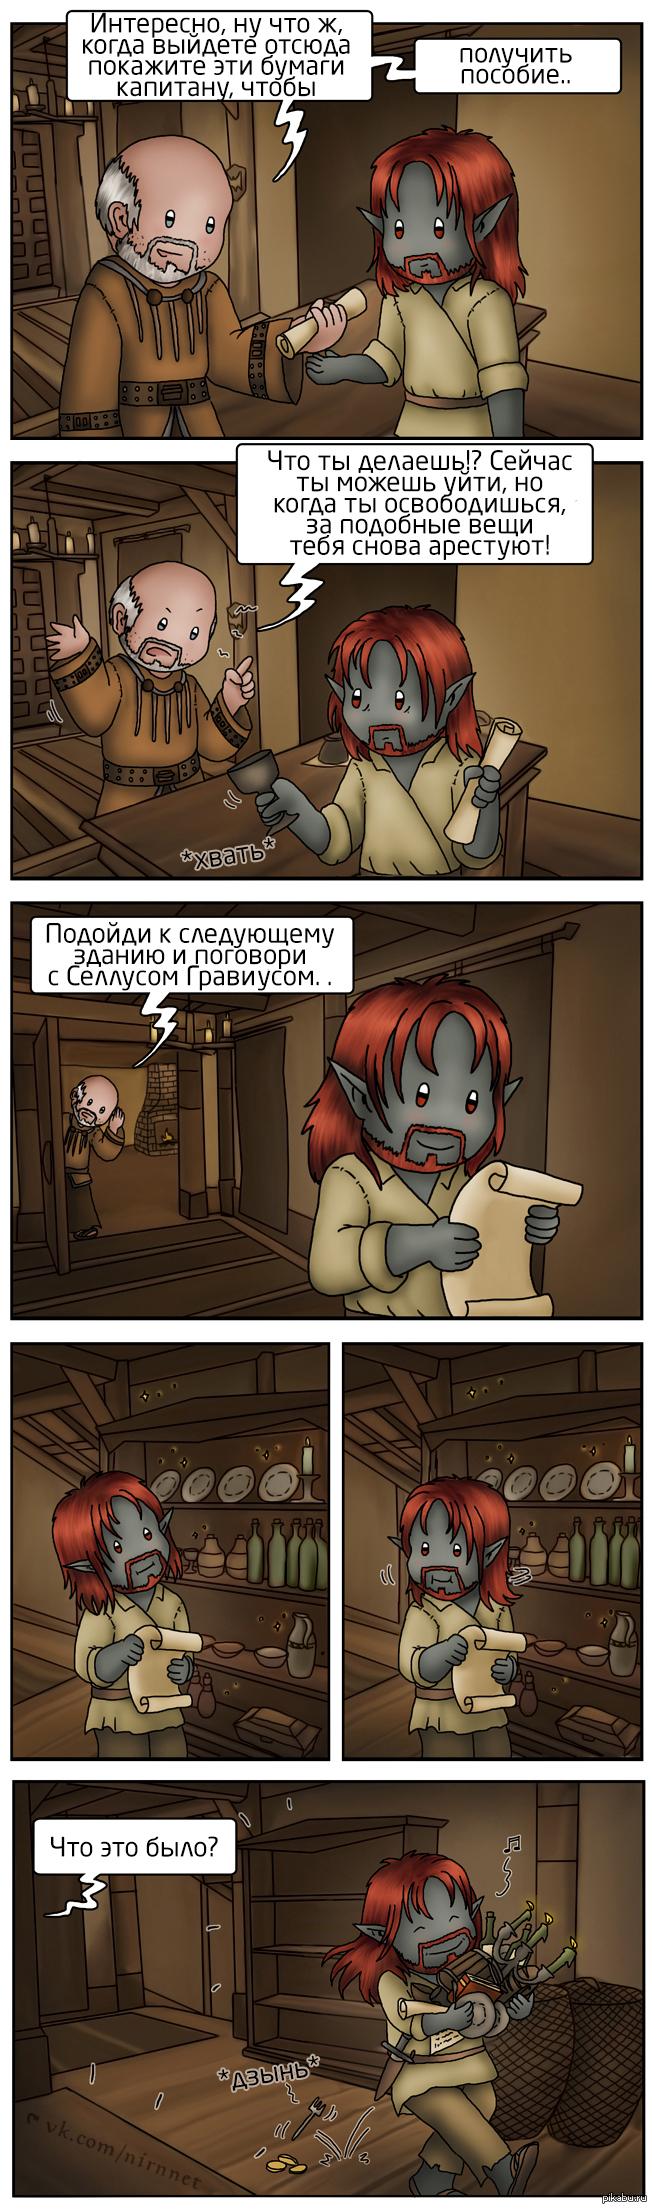 http://s.pikabu.ru/post_img/2013/07/20/10/1374339552_1949108038.jpg